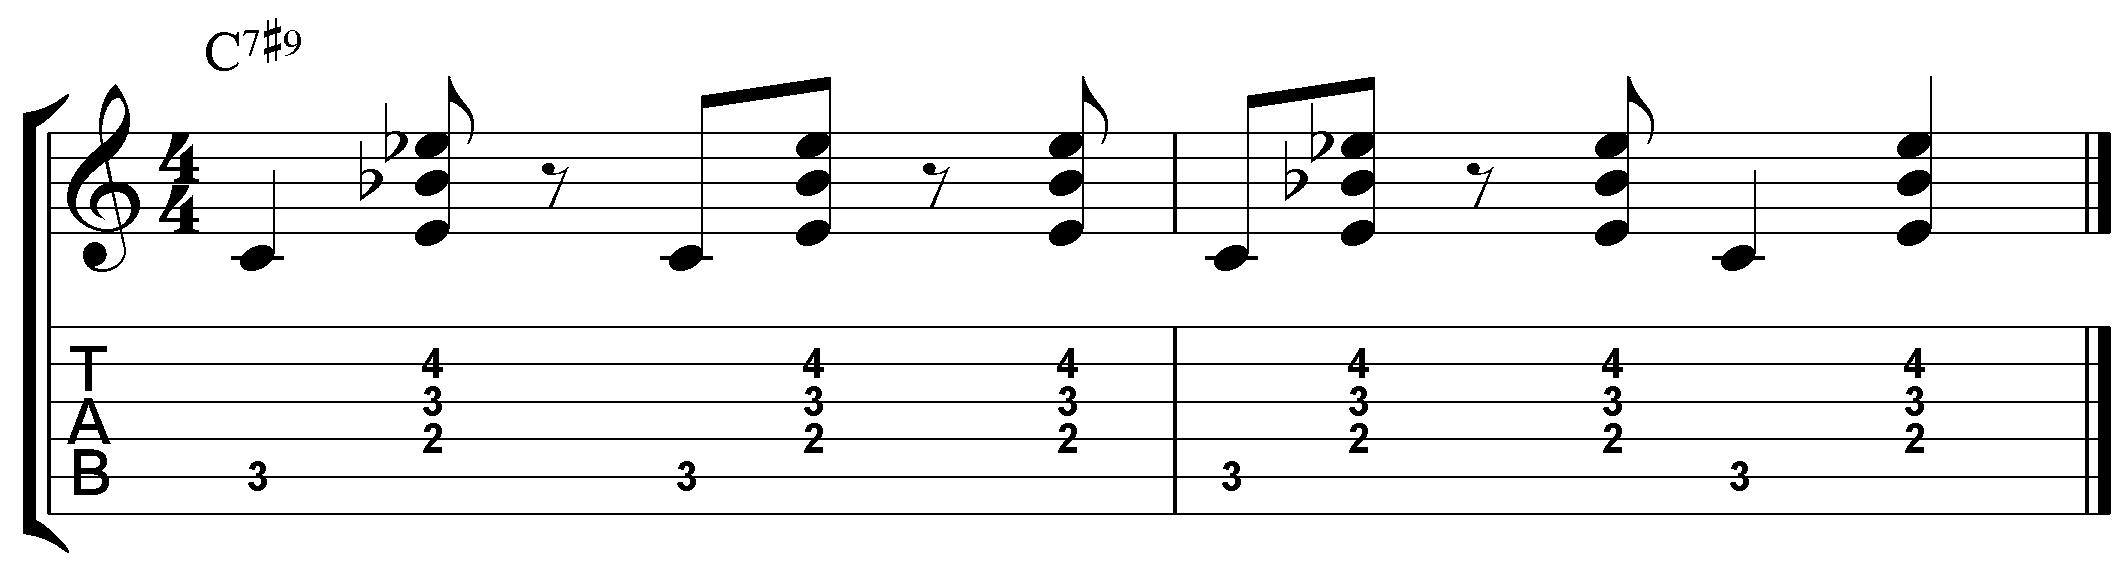 Major 7th Chord Inversions Guitar